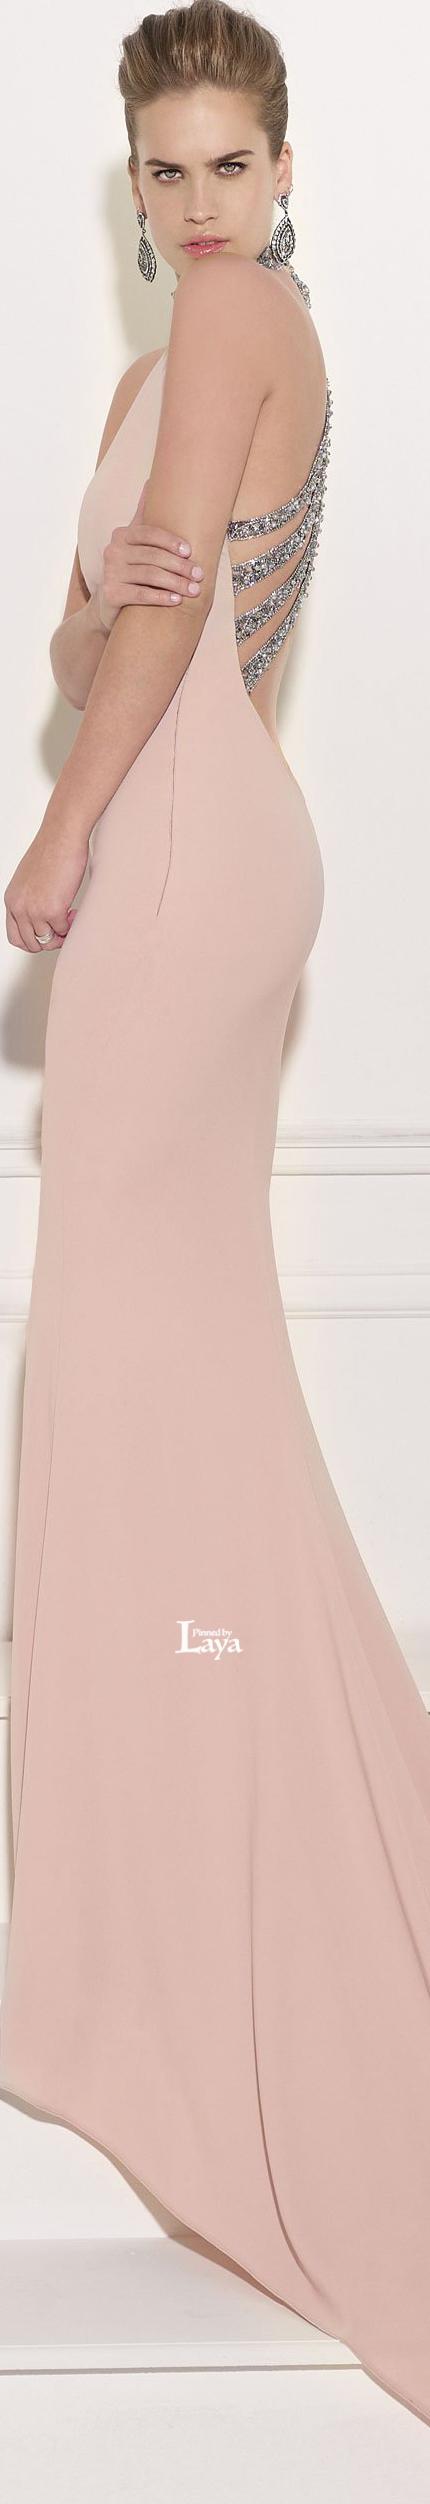 ♔LAYA♔TARIK EDIZ F2015♔ | gala | Pinterest | Vestidos de fiesta ...